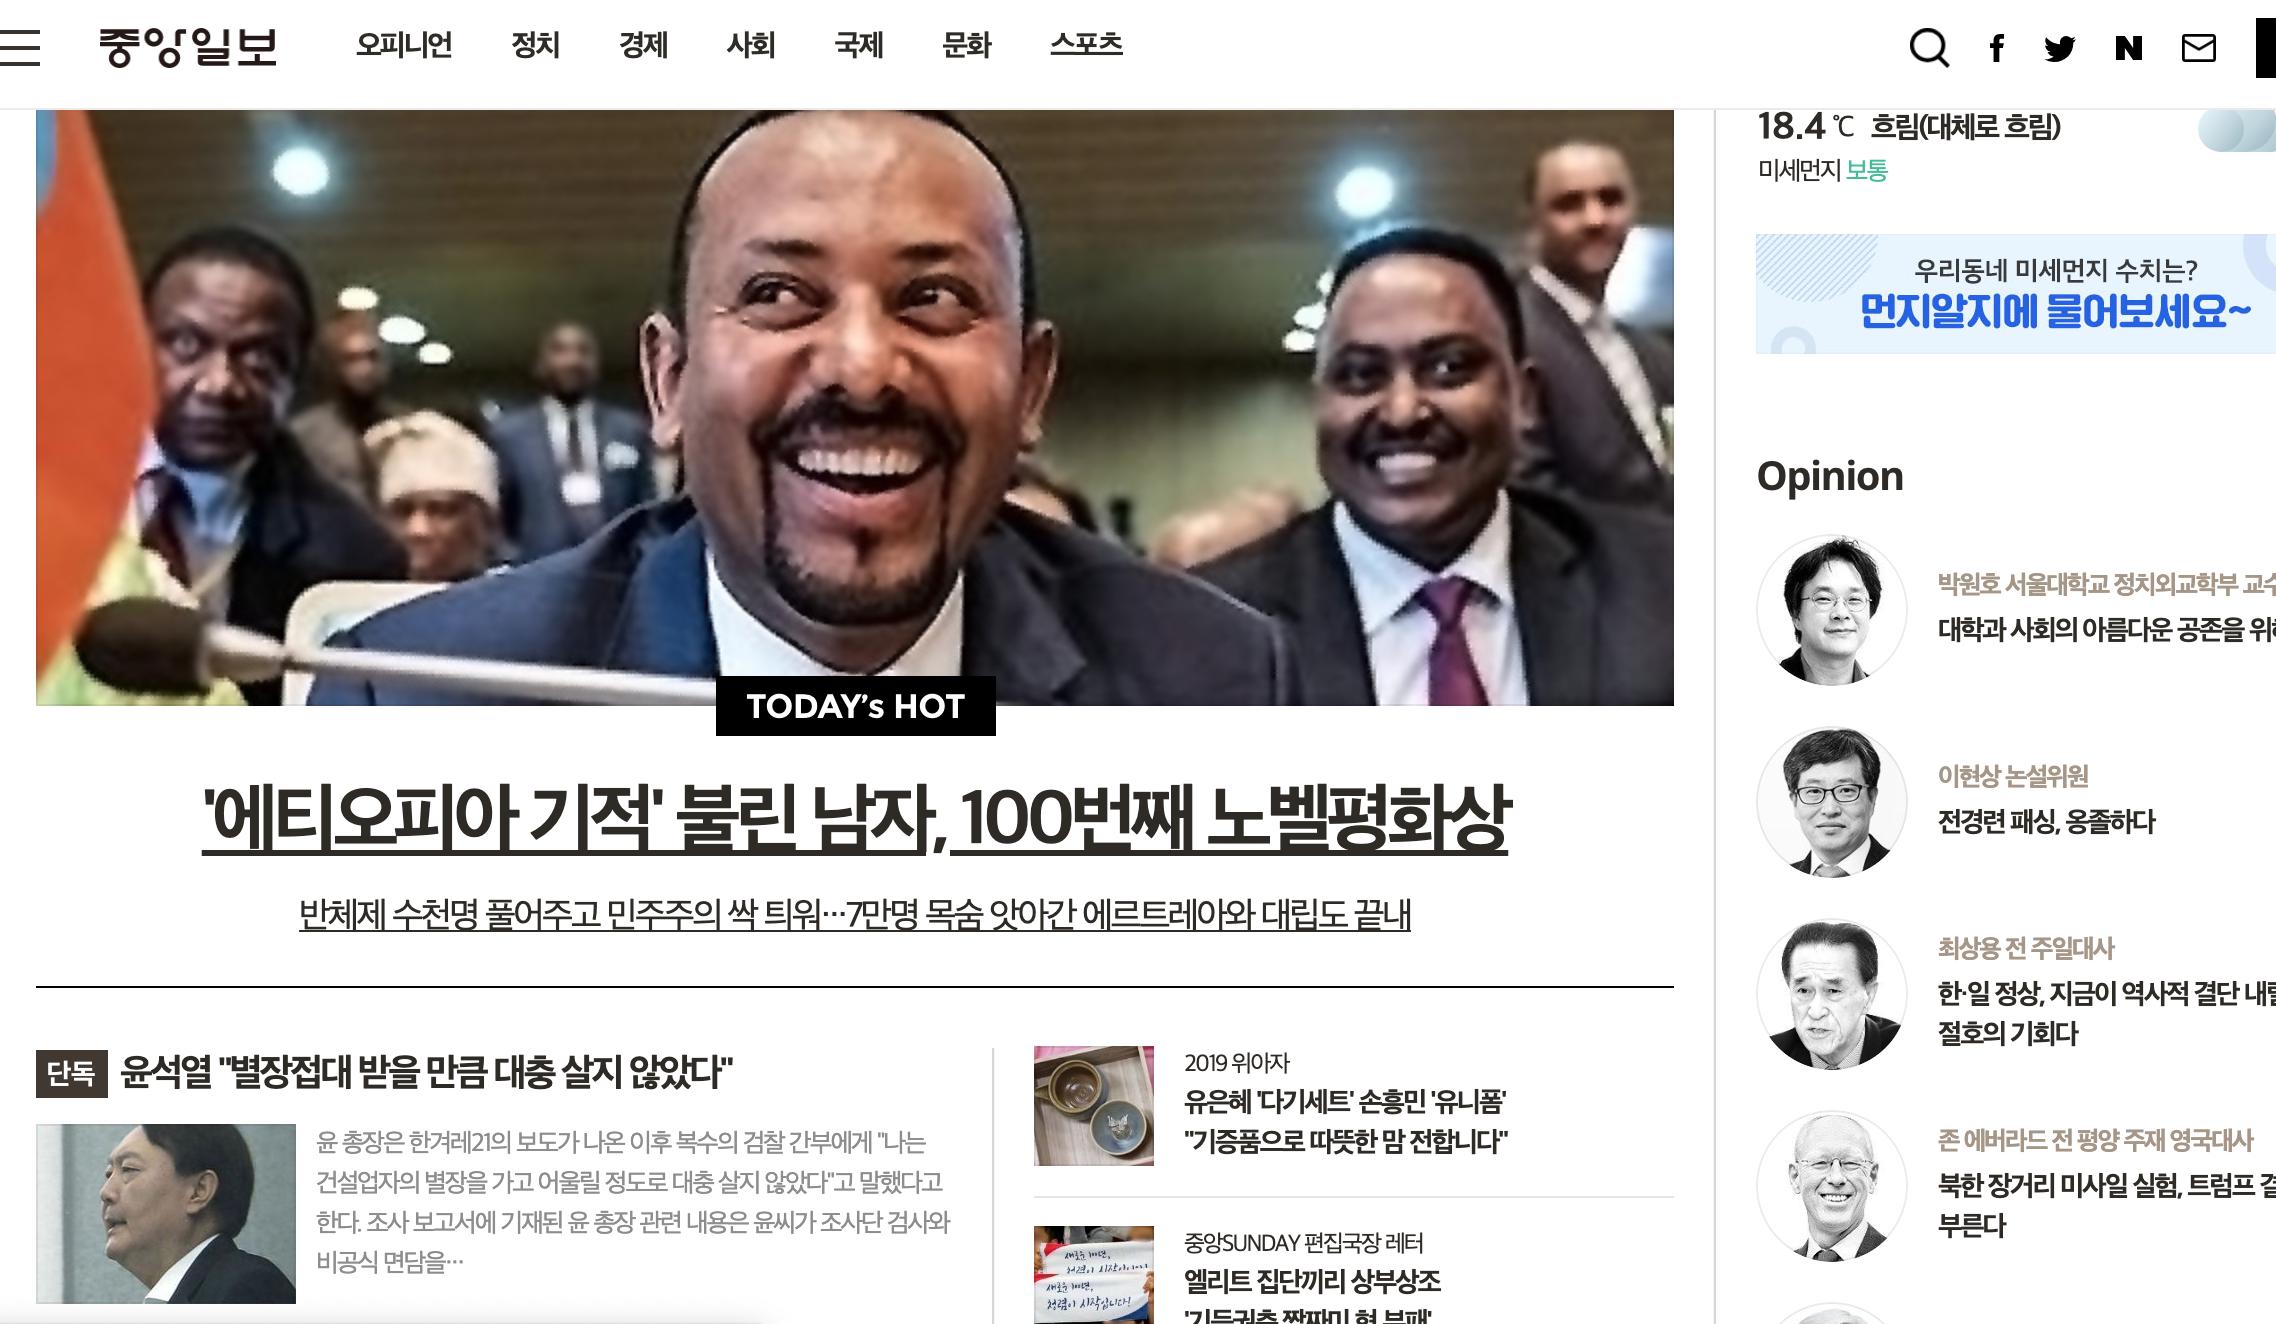 Korean Homepage of Korea JoongAng Daily, October 11, 2019 (https://joongang.joins.com/)